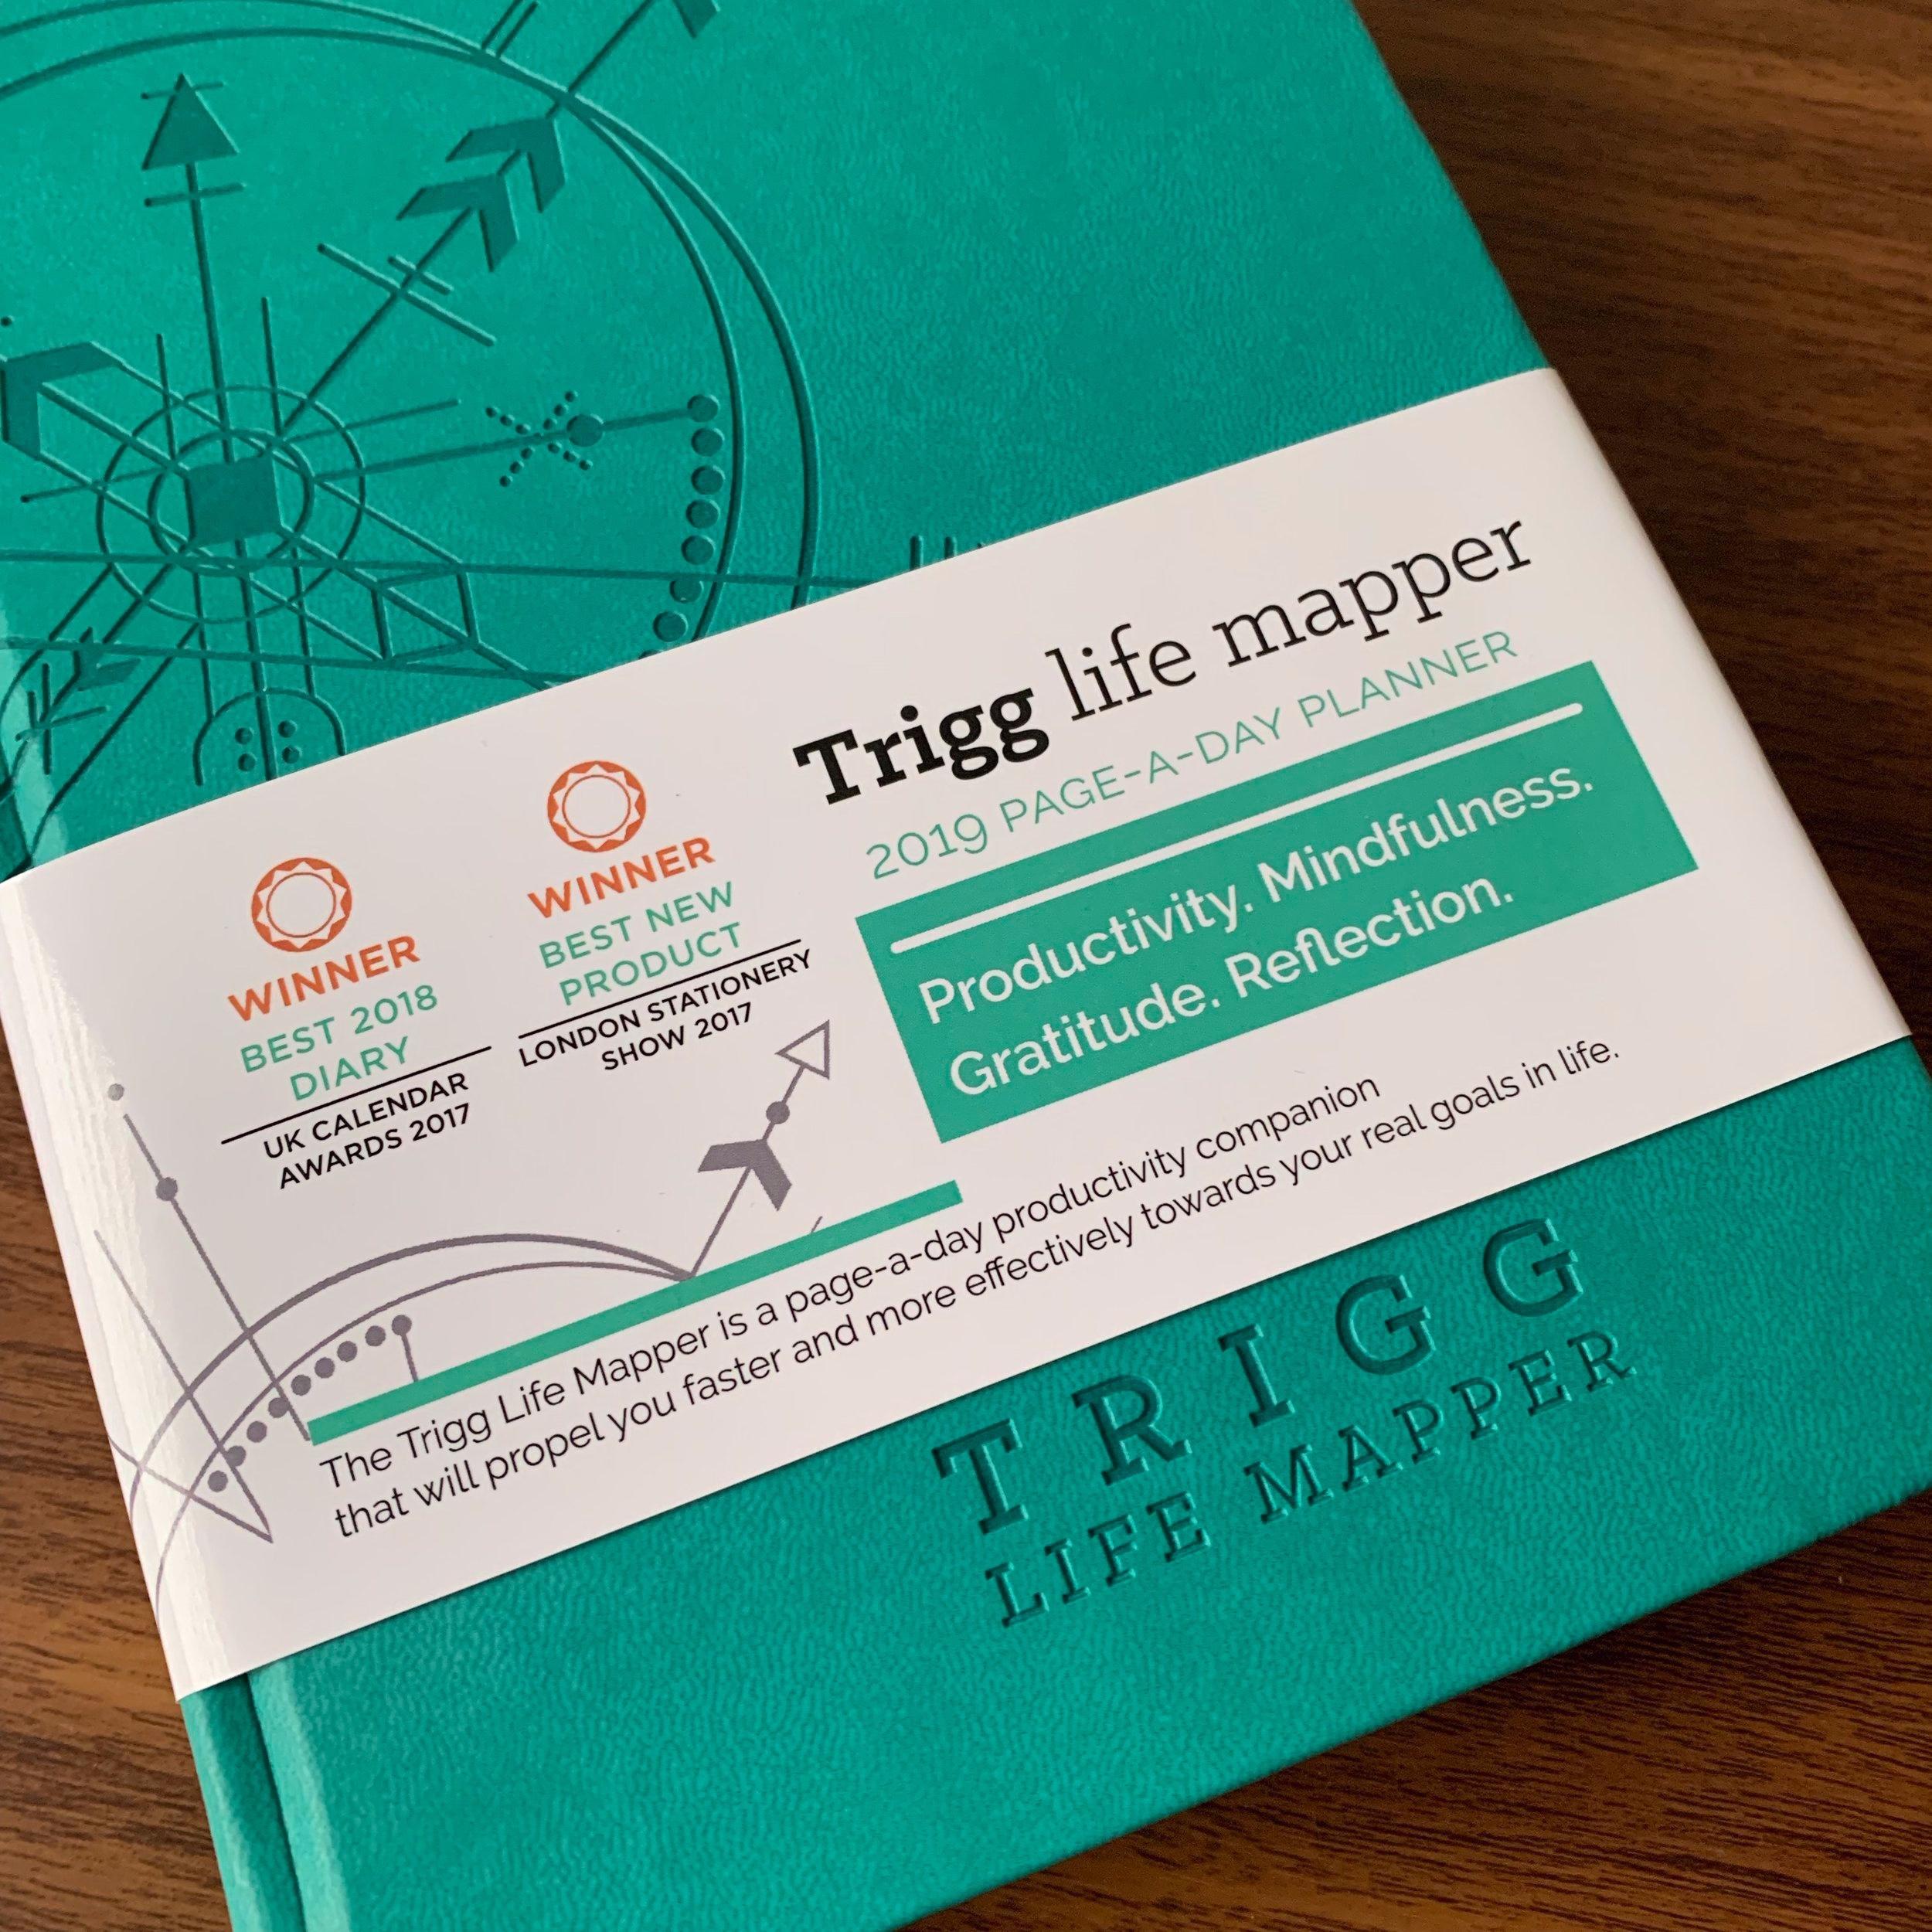 Trigg-Life-Mapper